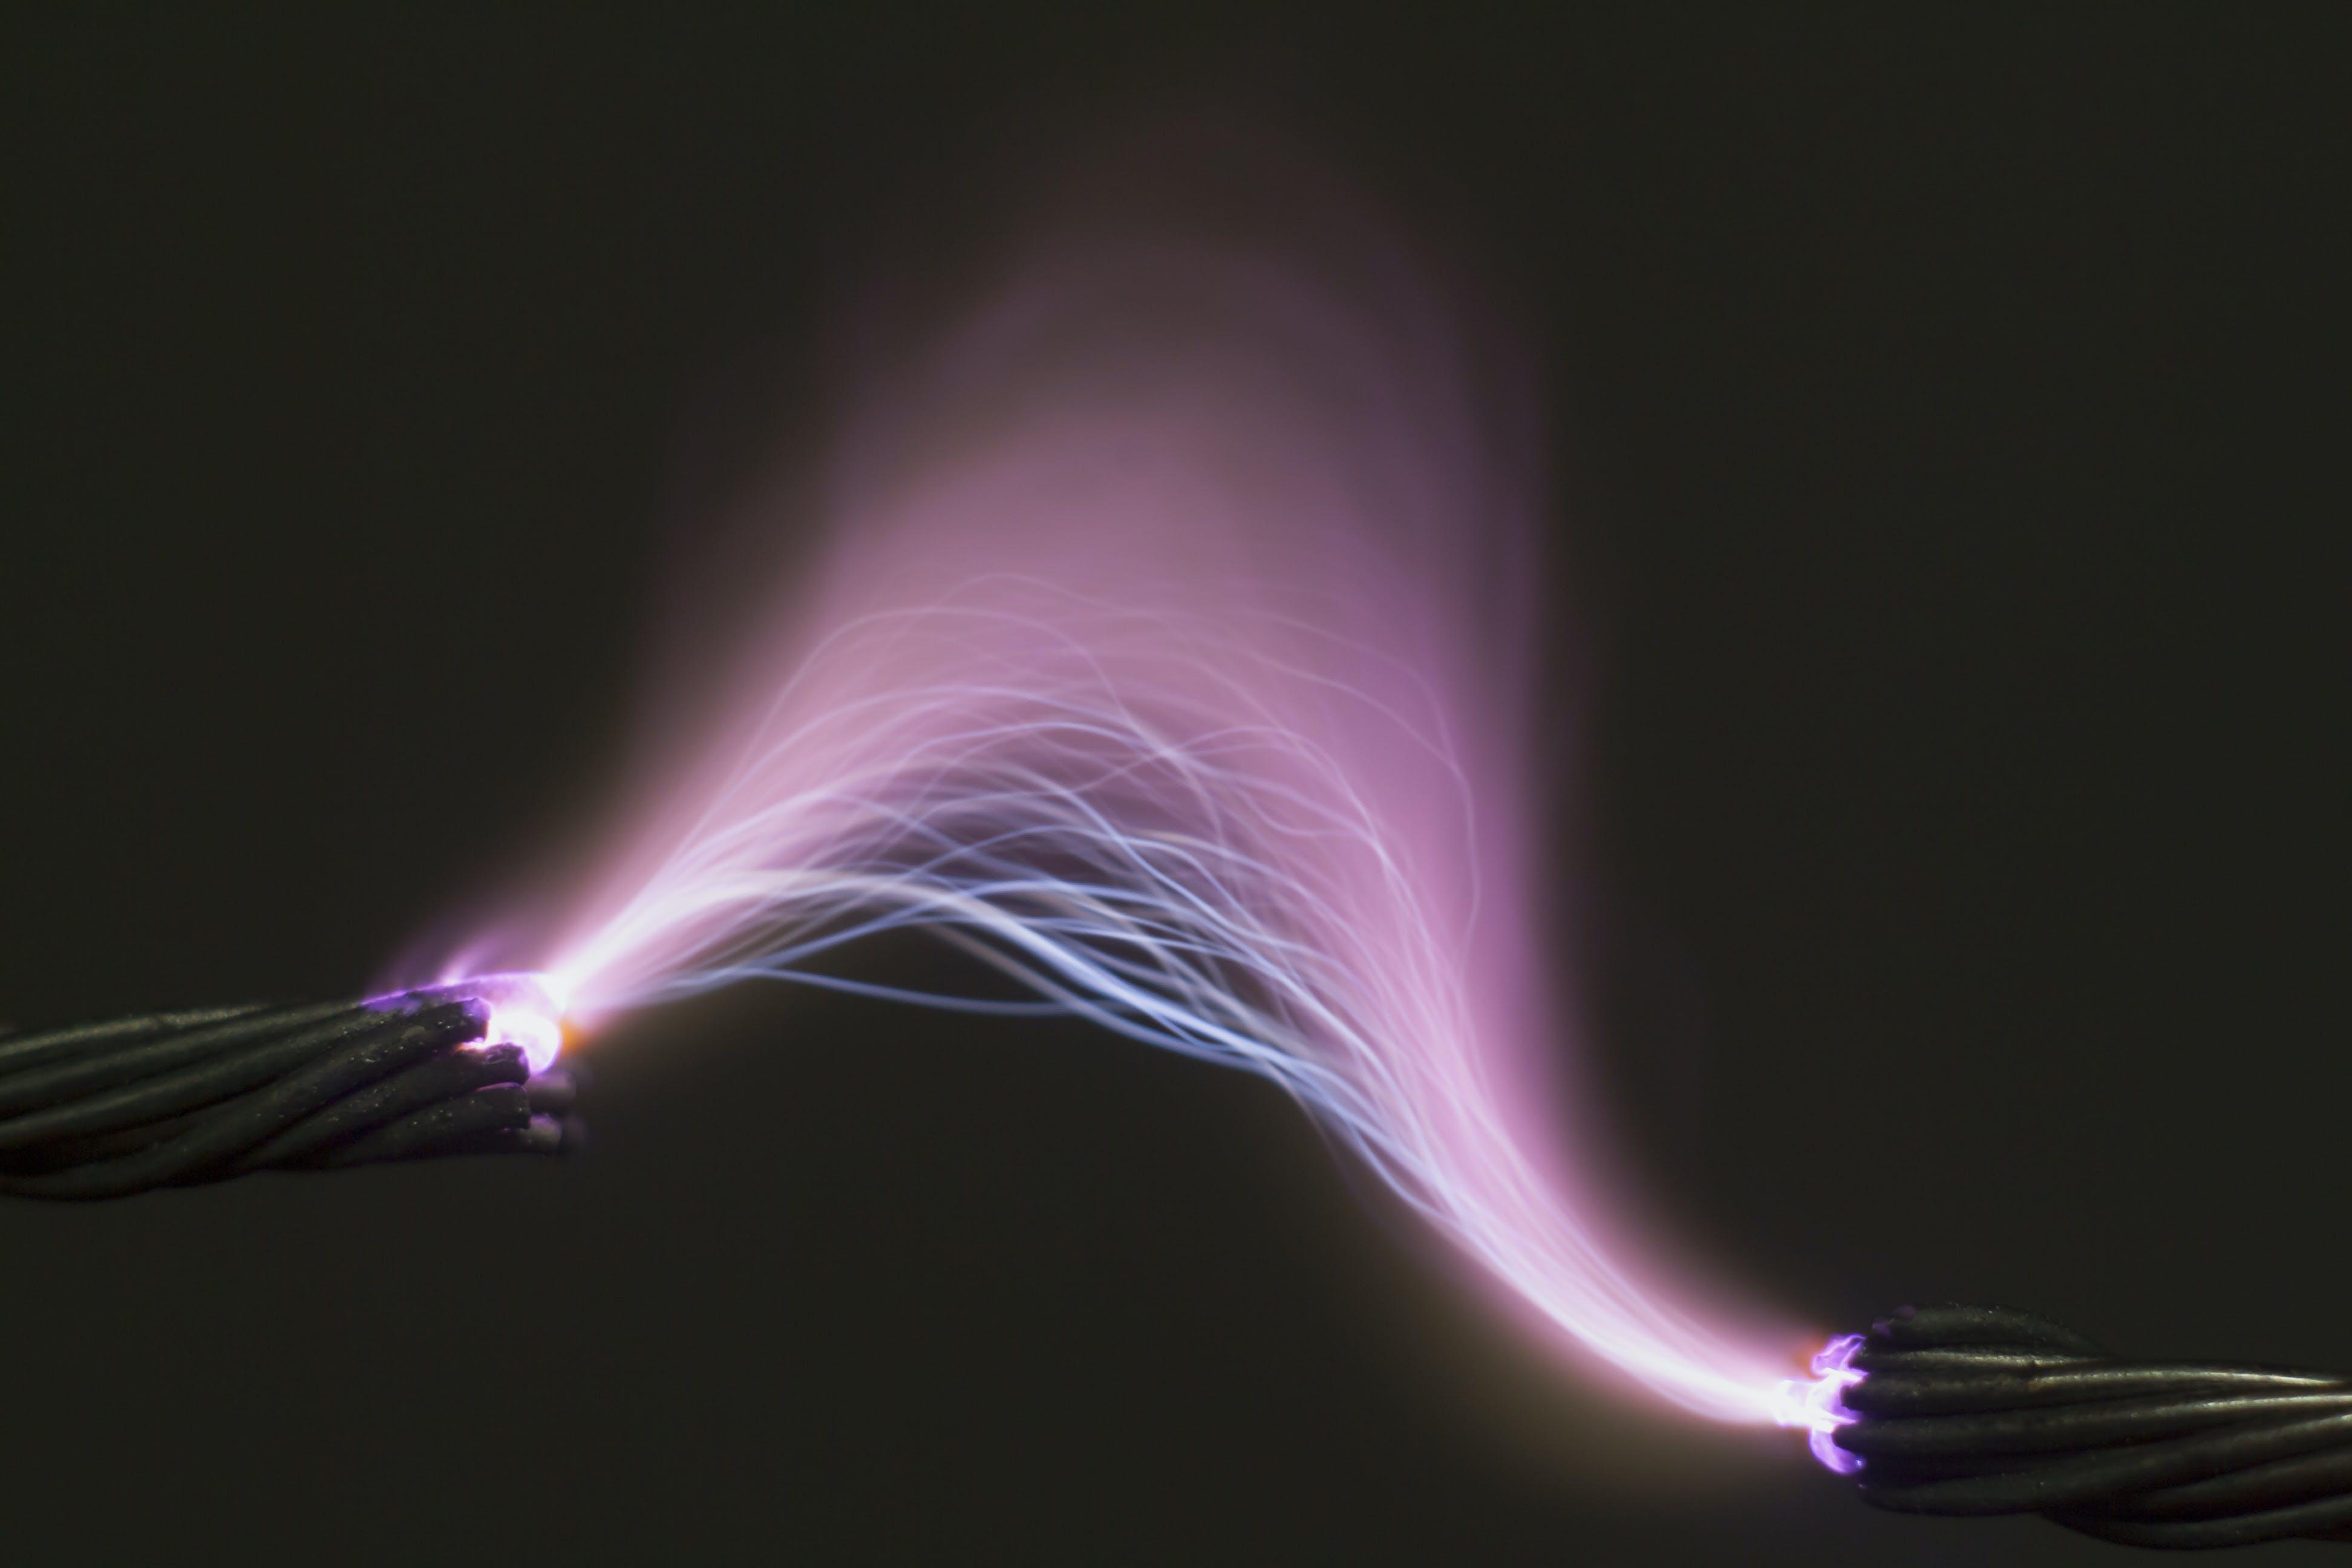 elektrische stroom